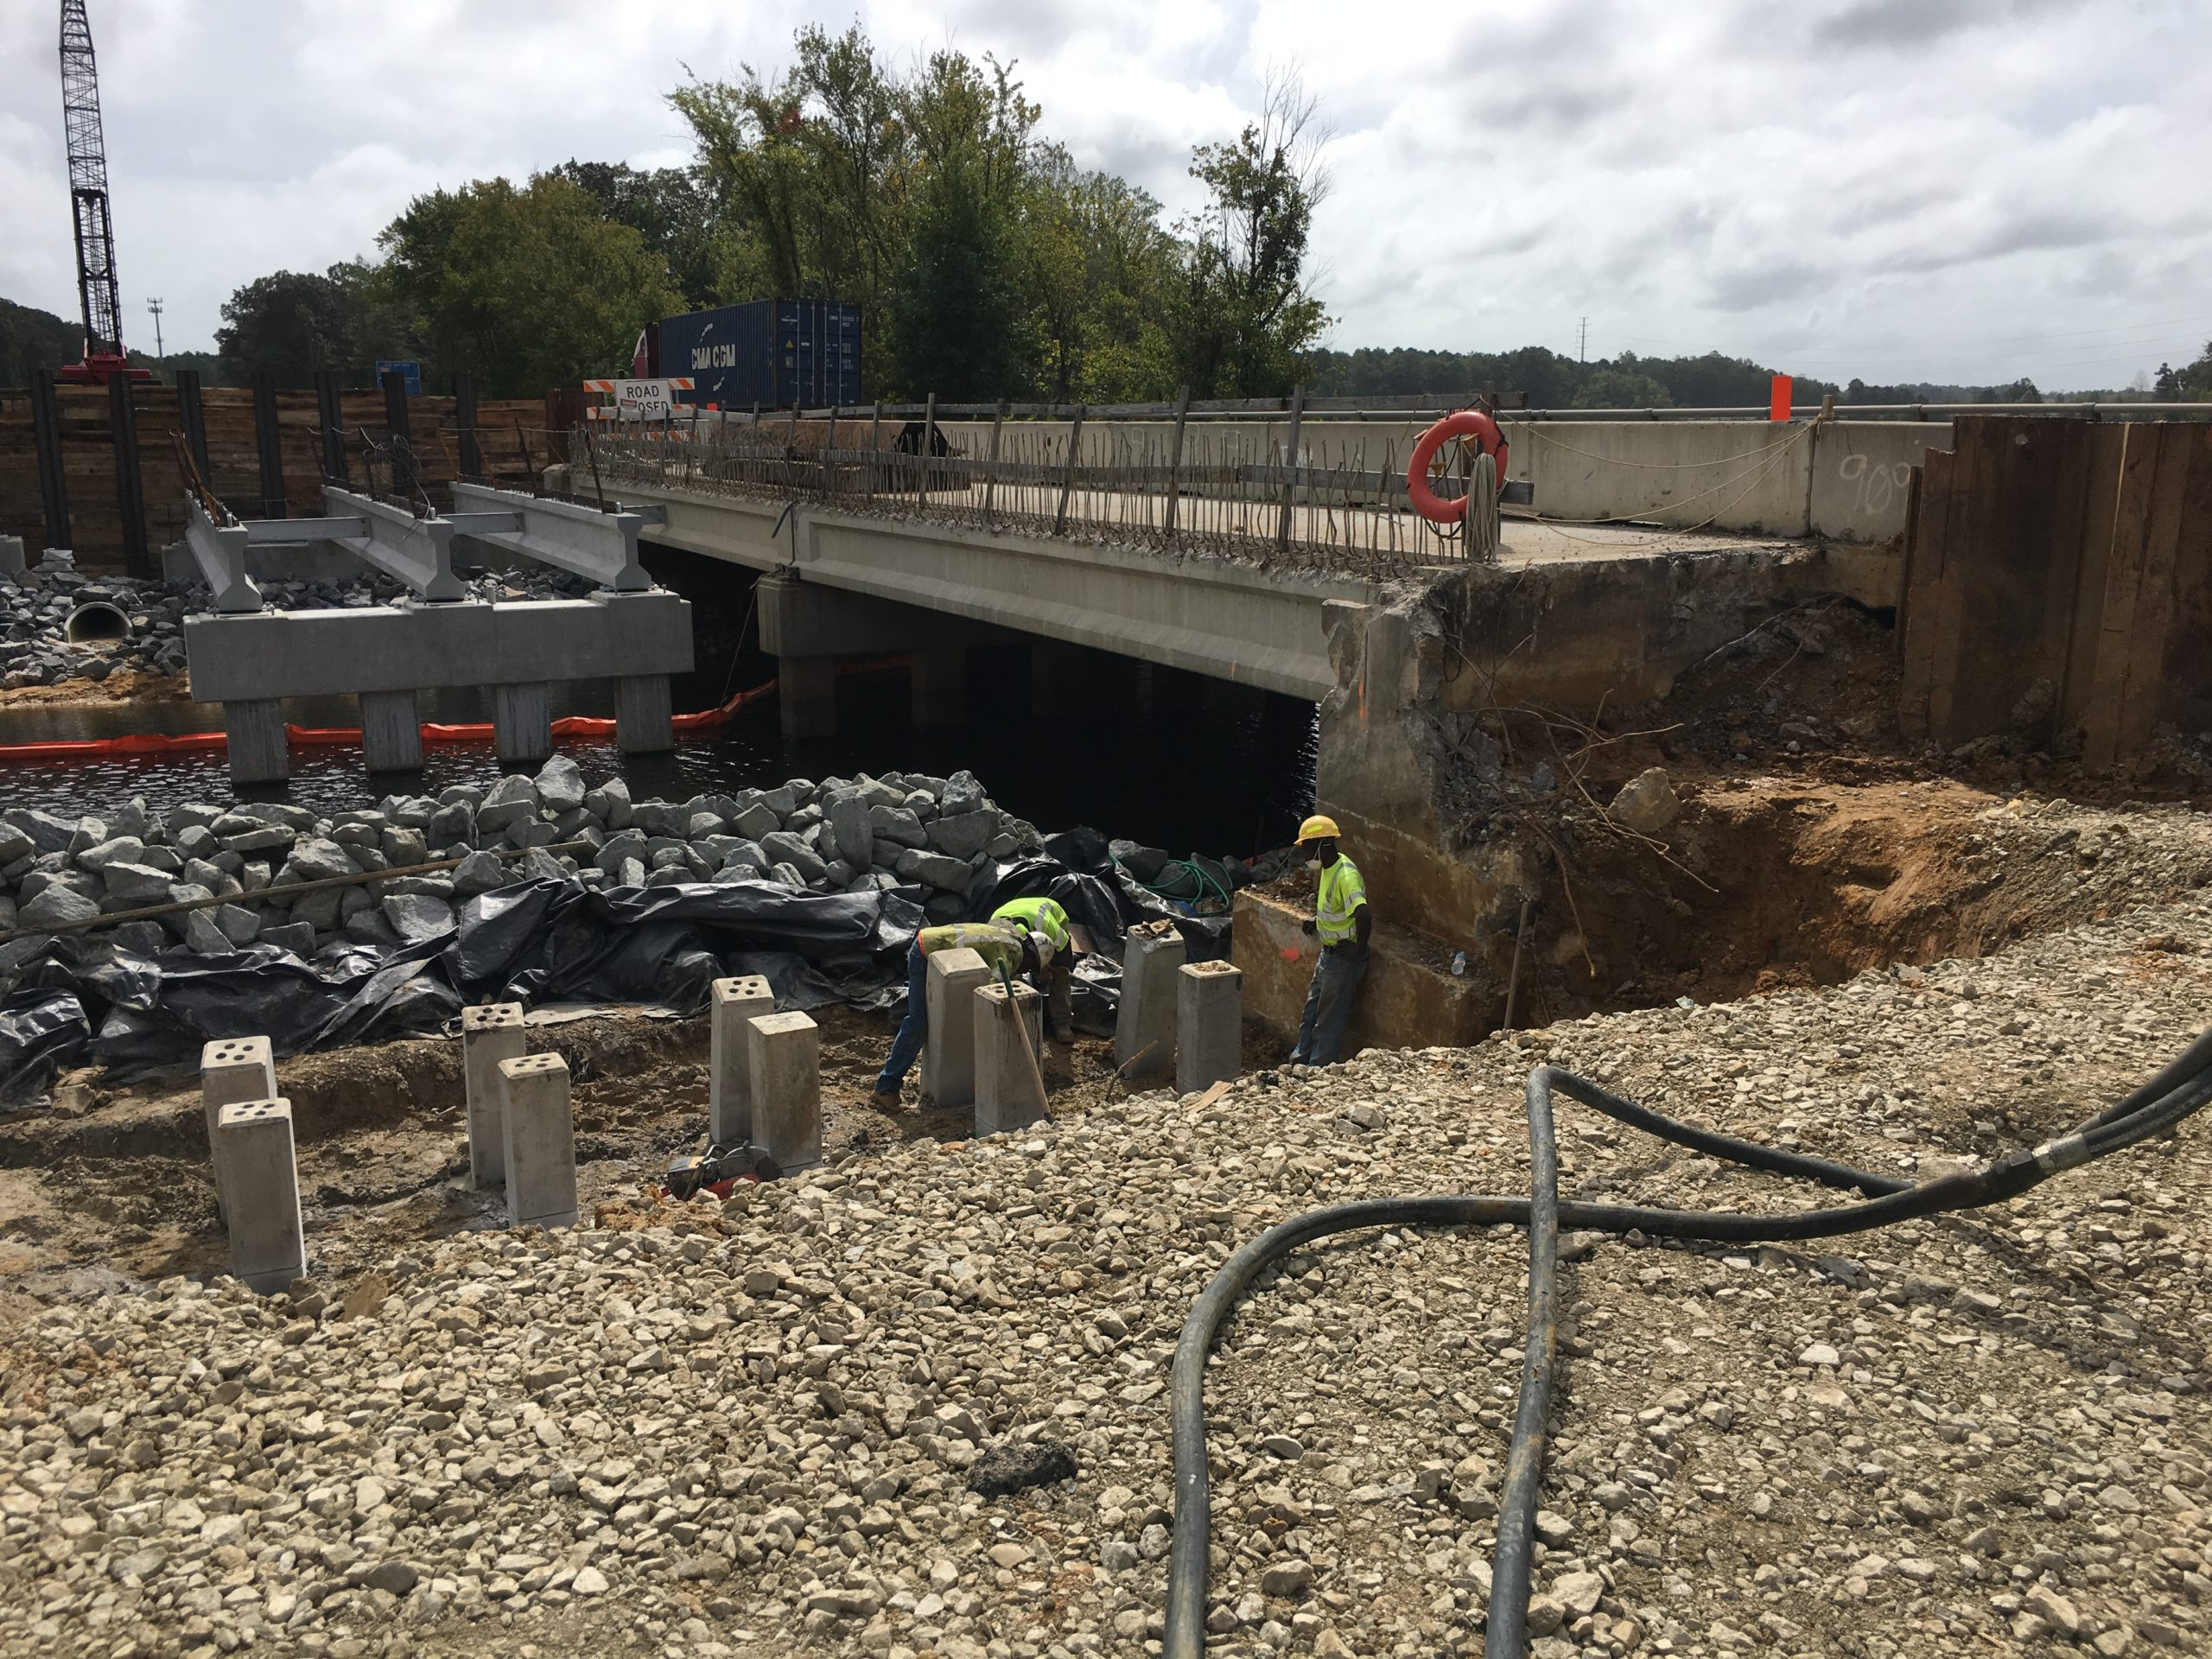 I-64 over Lee Hall Reservoir-Newport News, VA: Widening of the existing bridges for the I-64 Capacity Improvements-Segment I project